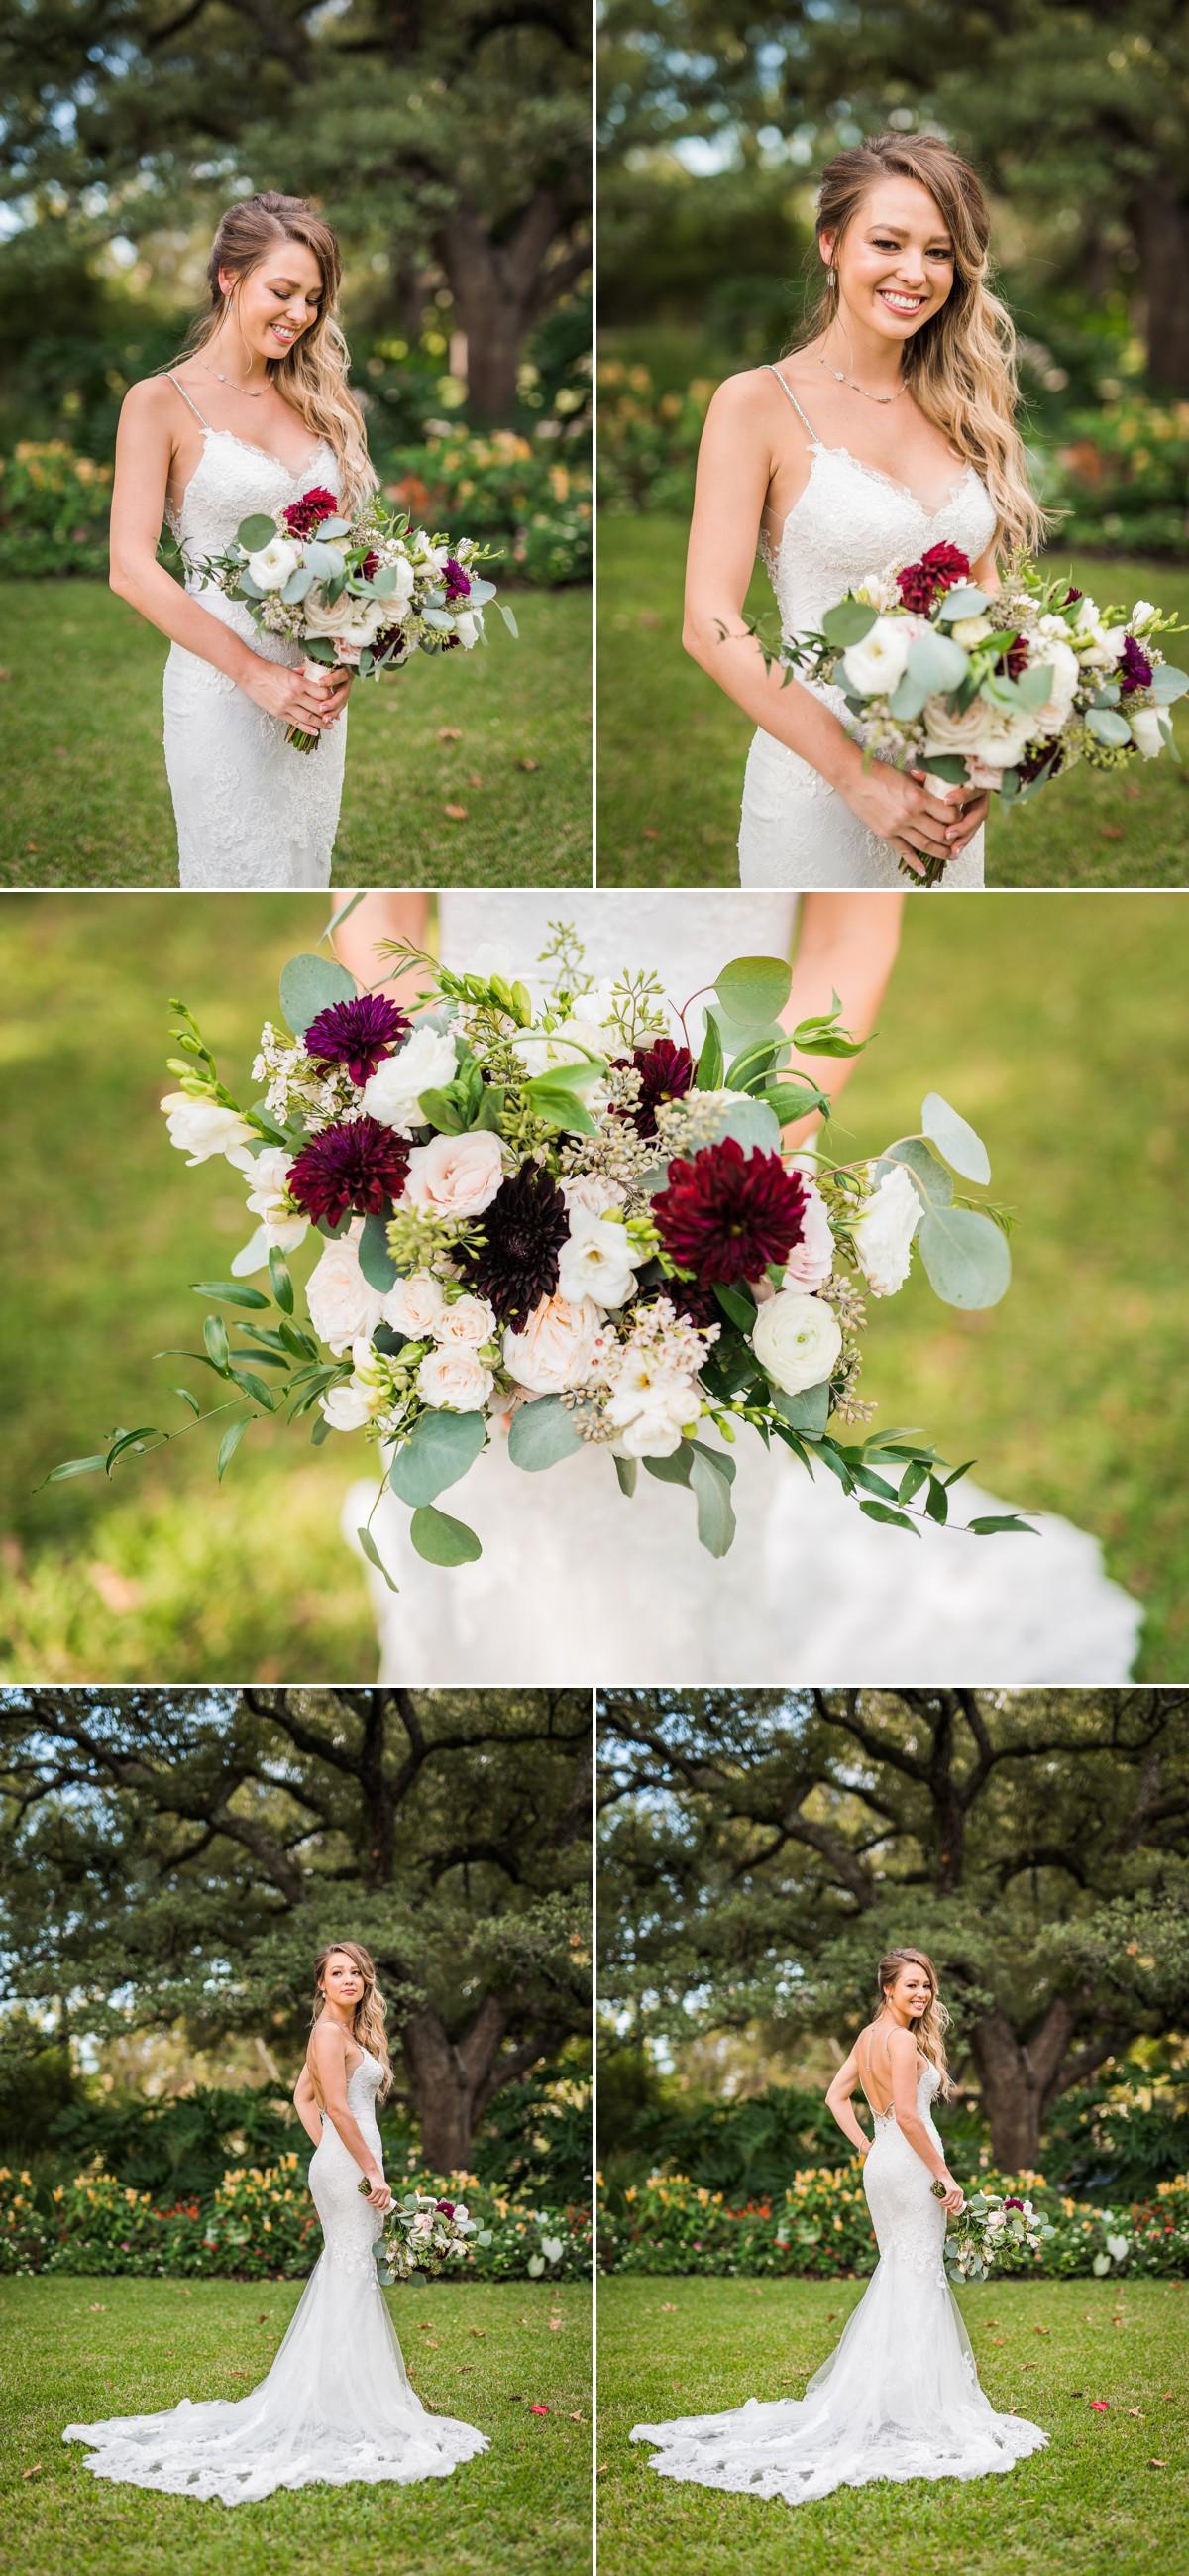 Manor House Wedding at The Houstonian Hotel Bridal Portraits Flowers